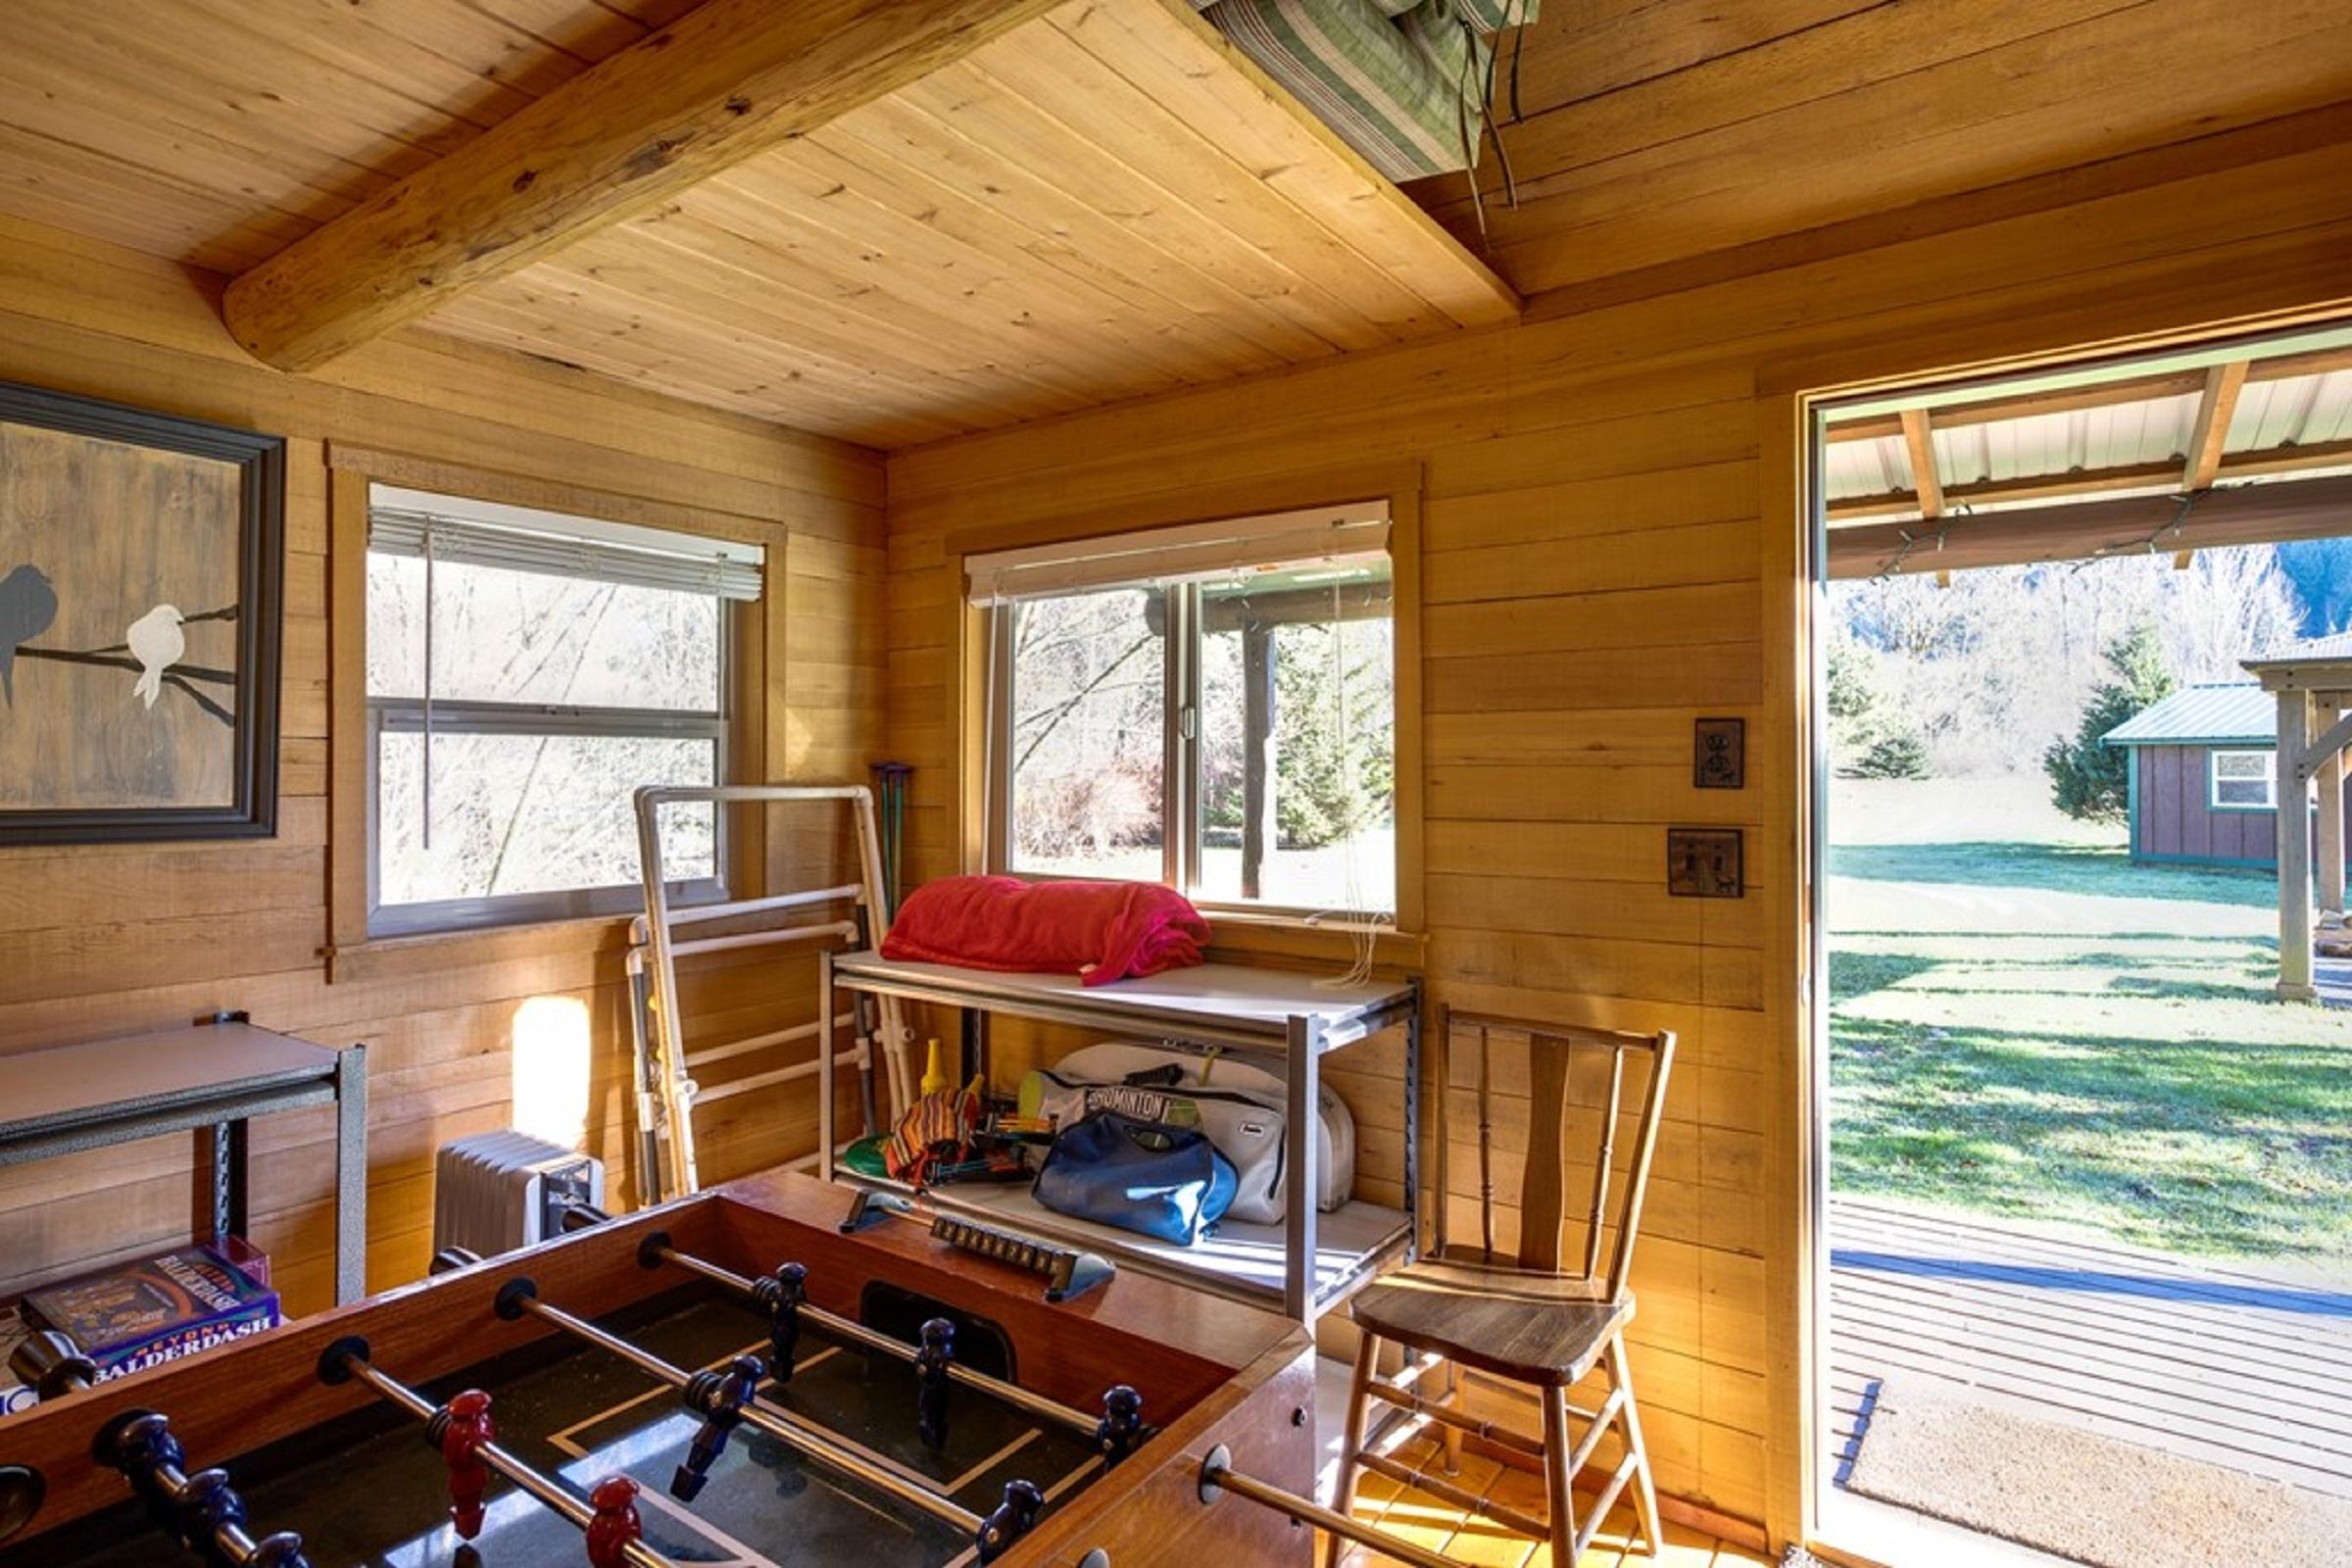 Apartment Mt  Baker Lodging Cabin  72  ndash  PET FRIENDY  MT VIEWS  BBQ  SLEEPS 2  photo 31818168